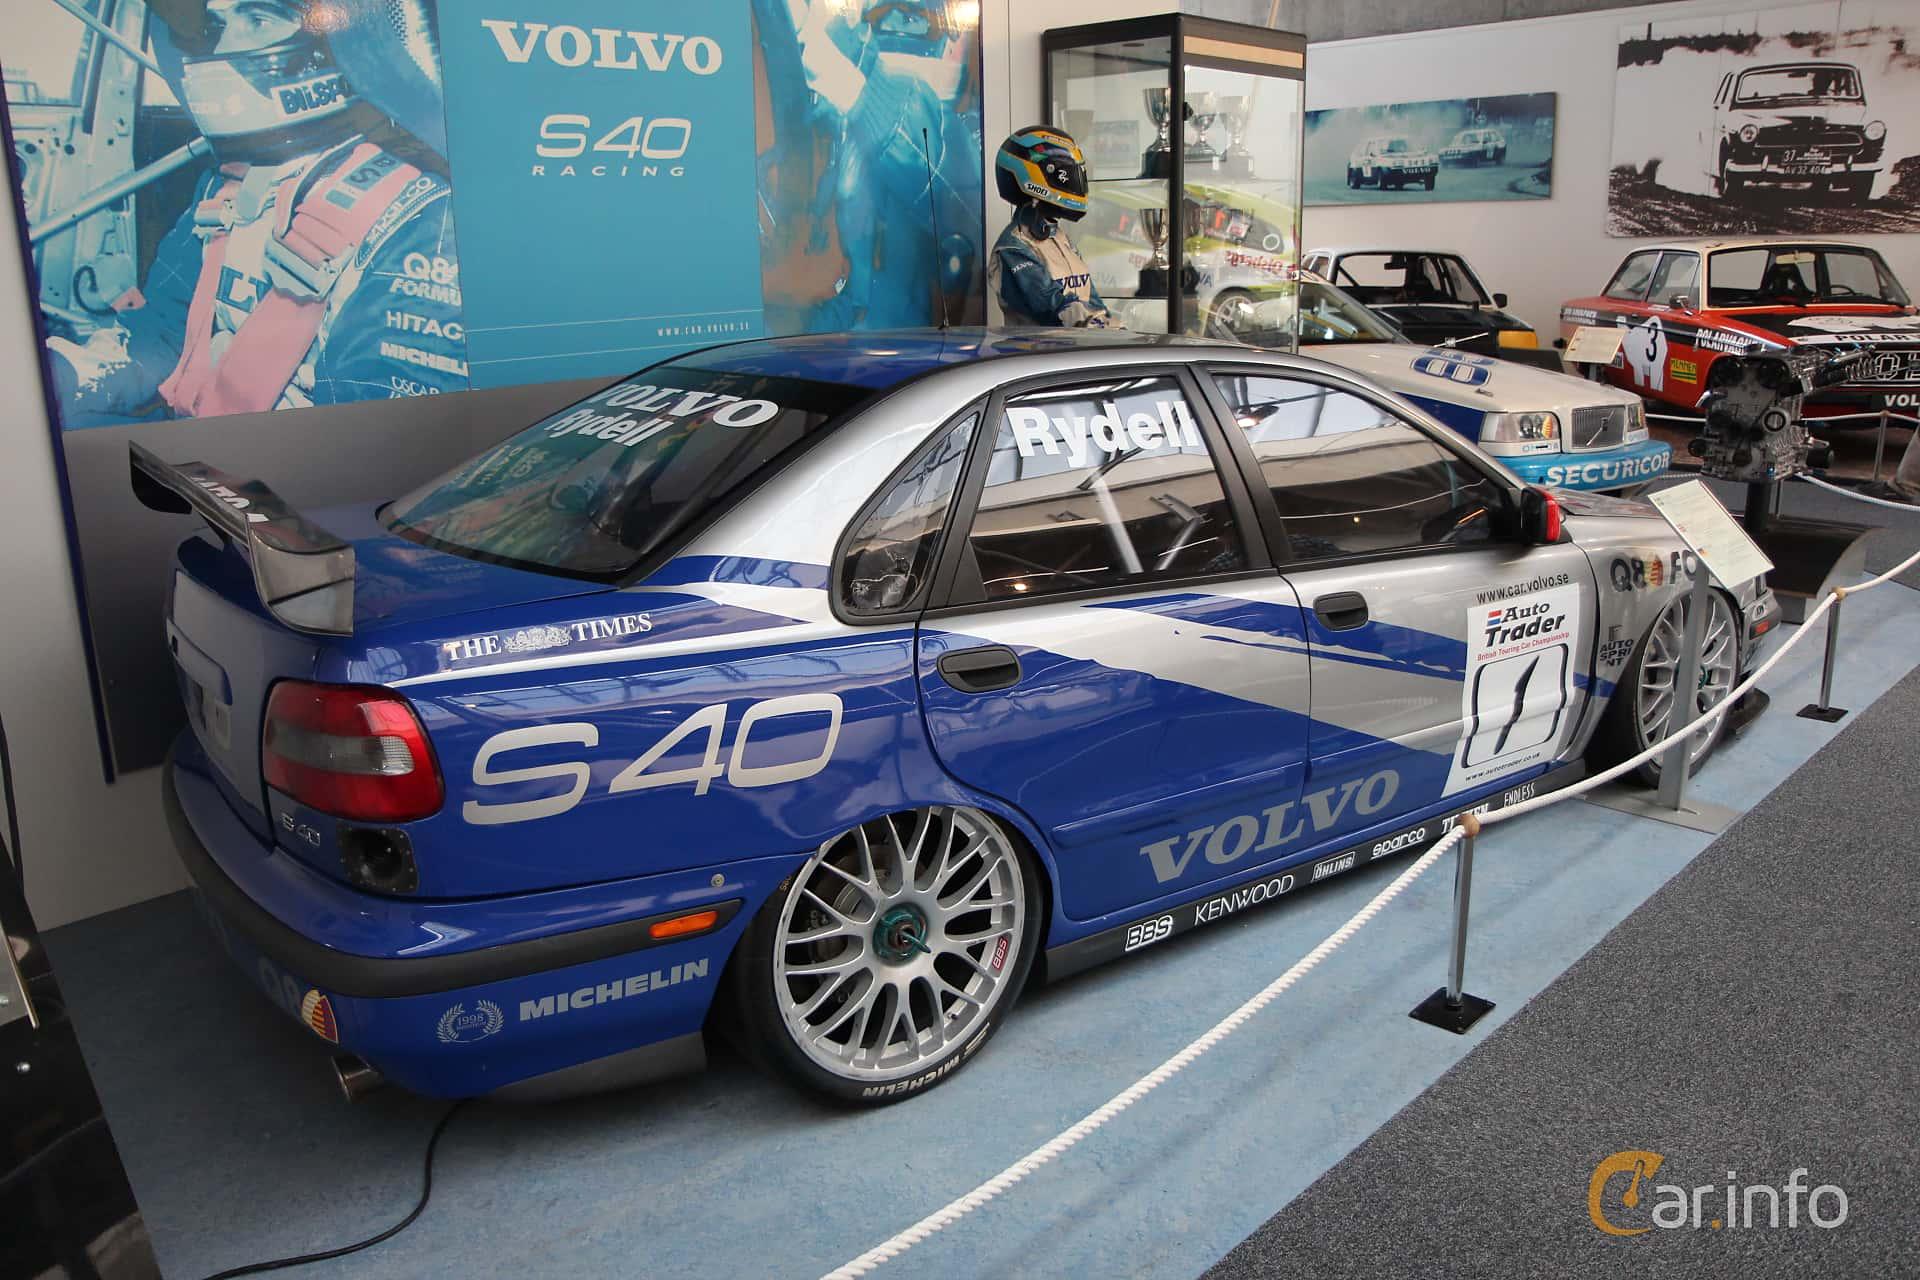 volvo-s40-back-side-1-162512.jpg